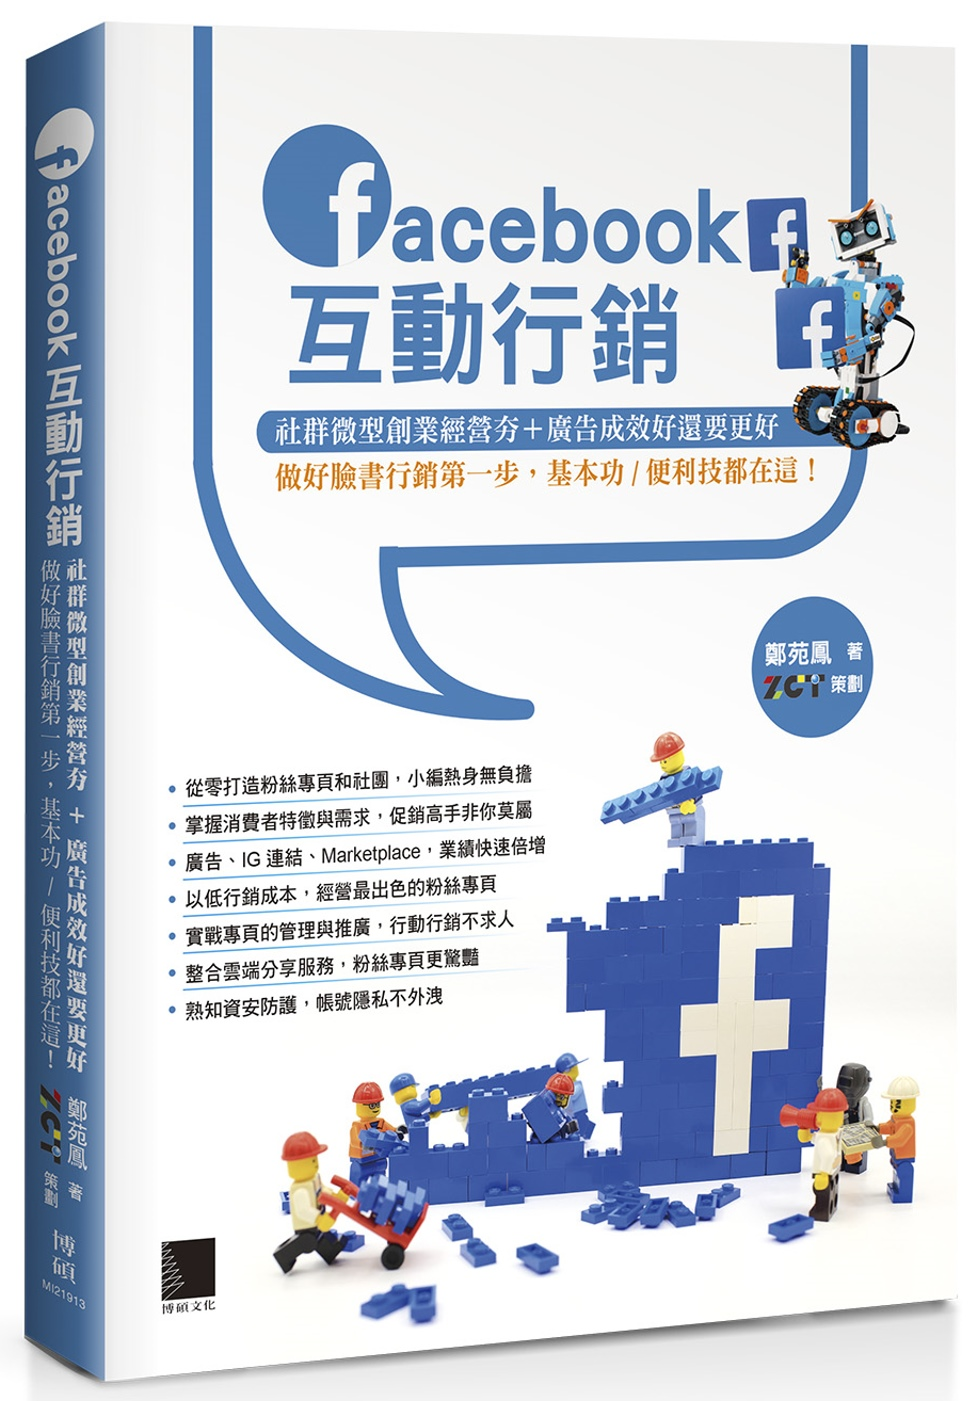 Facebook互動行銷:社群微型創業經營夯+廣告成效好還要更好,做好臉書行銷第一步,基本功/便利技都在這!